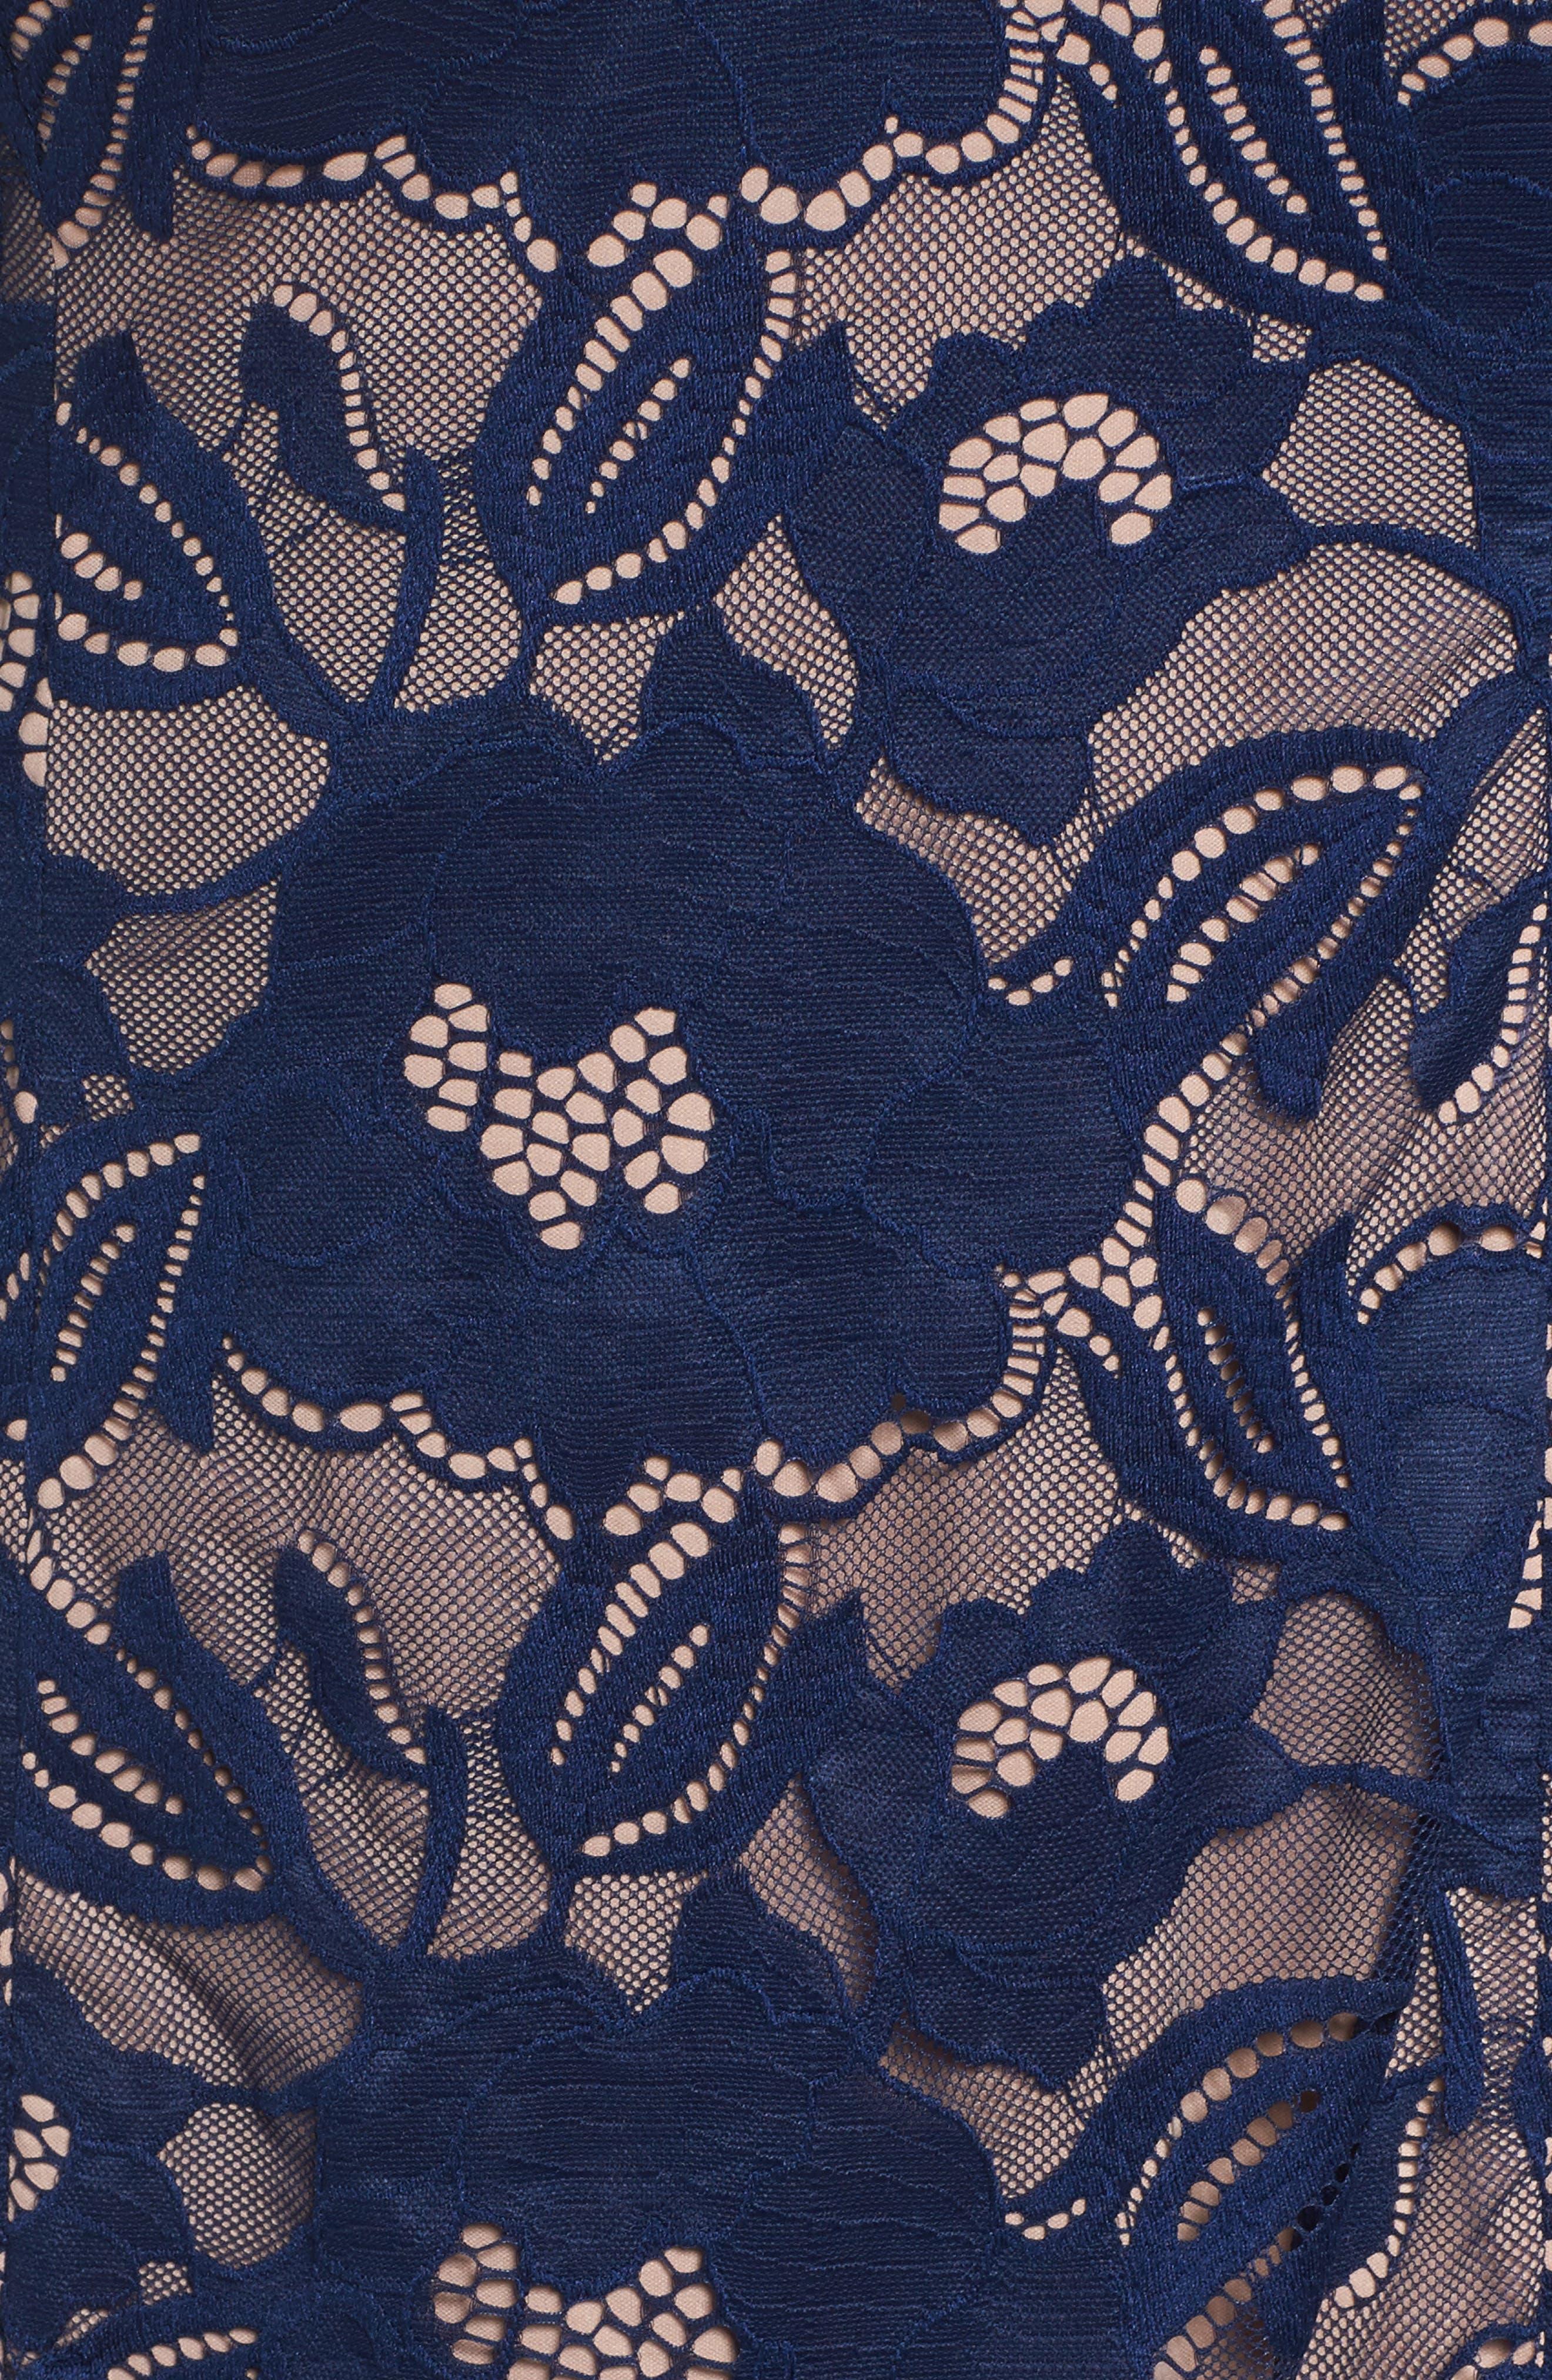 Ruffle Sleeve Lace Dress,                             Alternate thumbnail 5, color,                             412